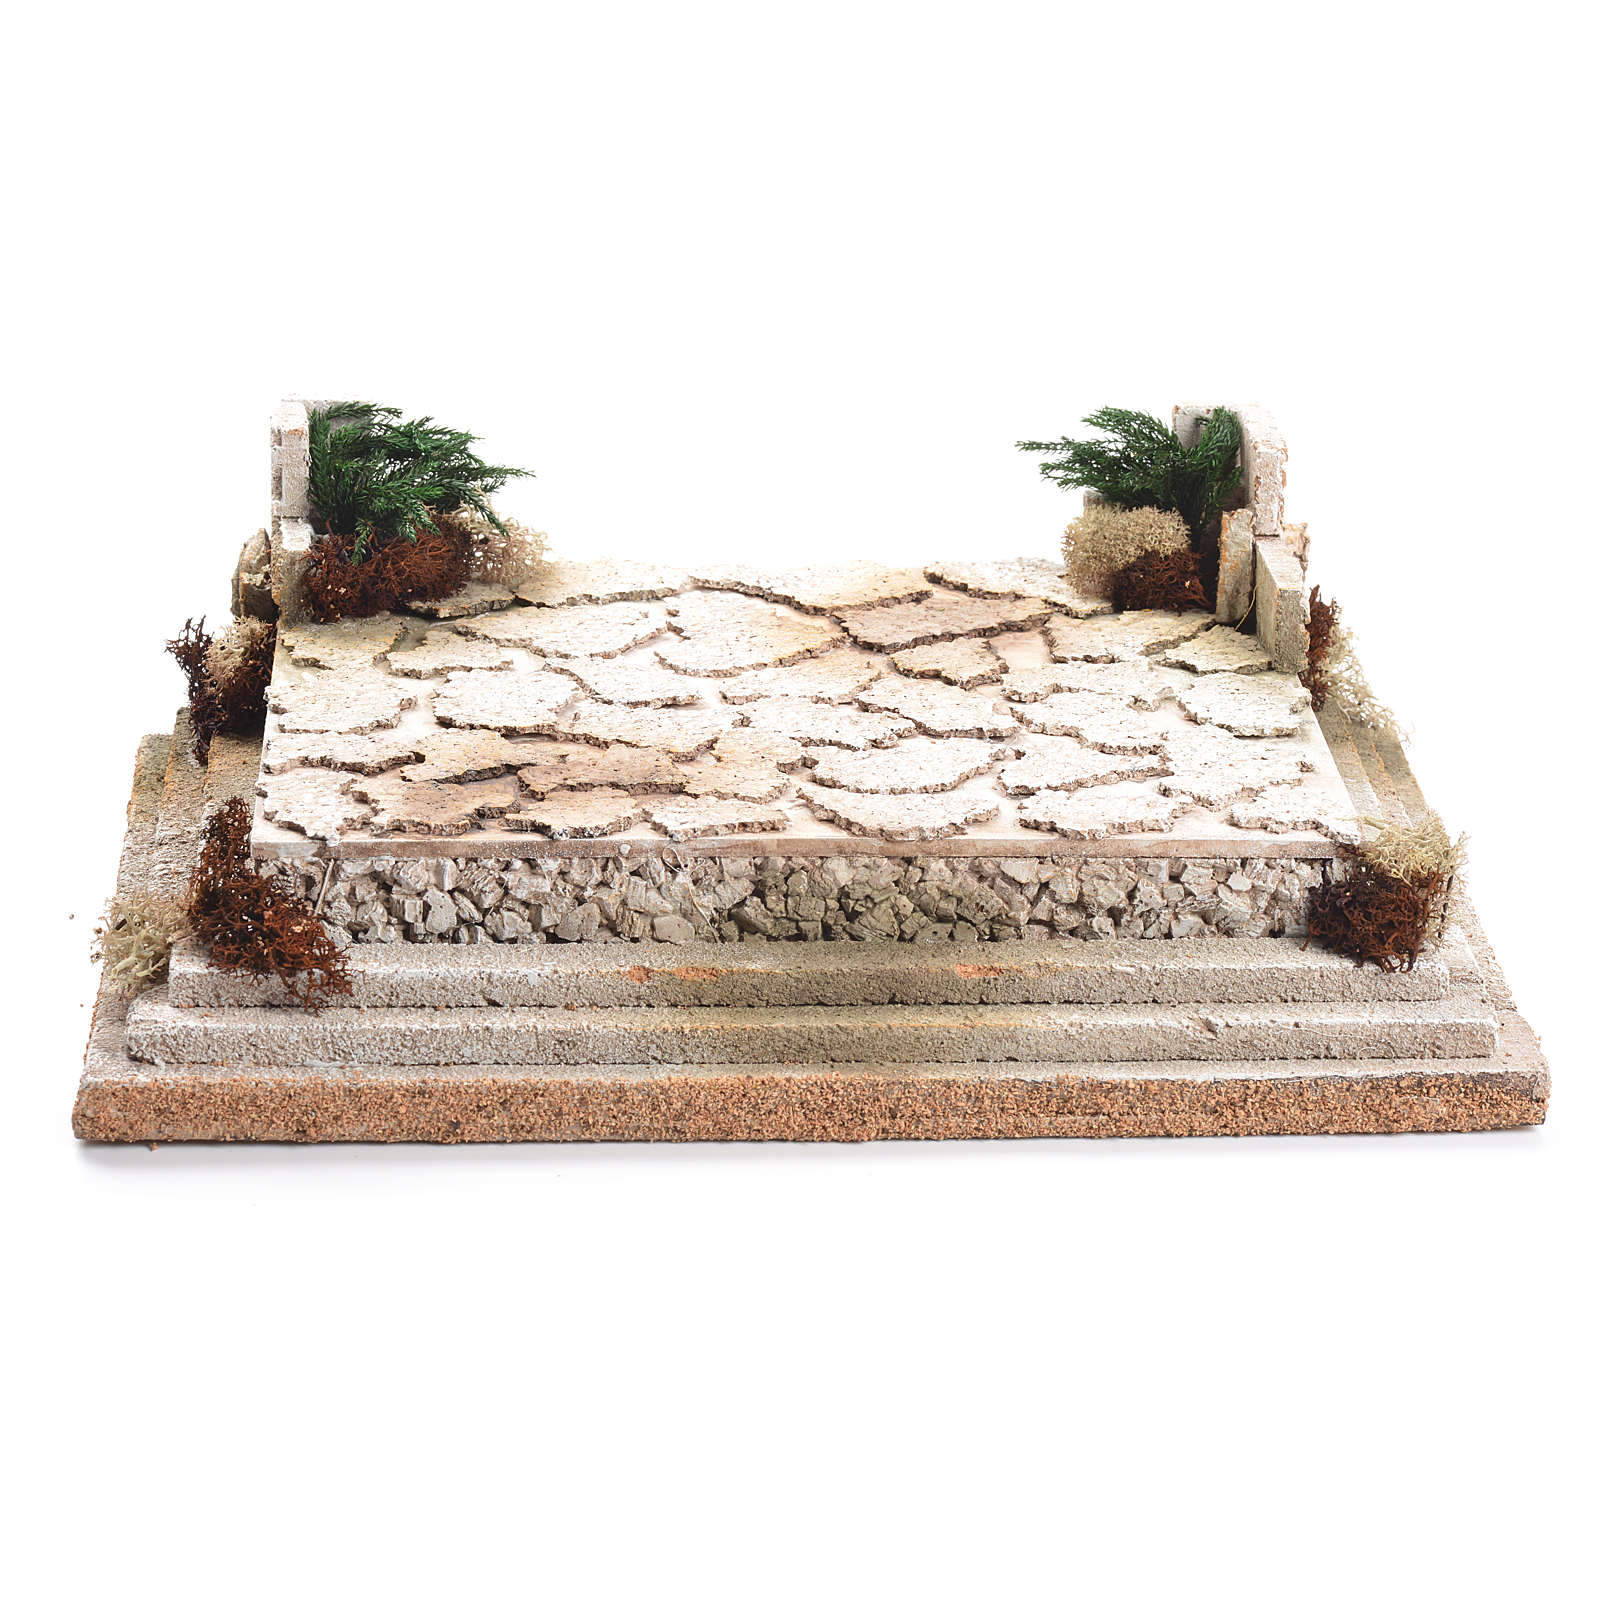 Plaza para belén de corcho 12x35x26 cm 4